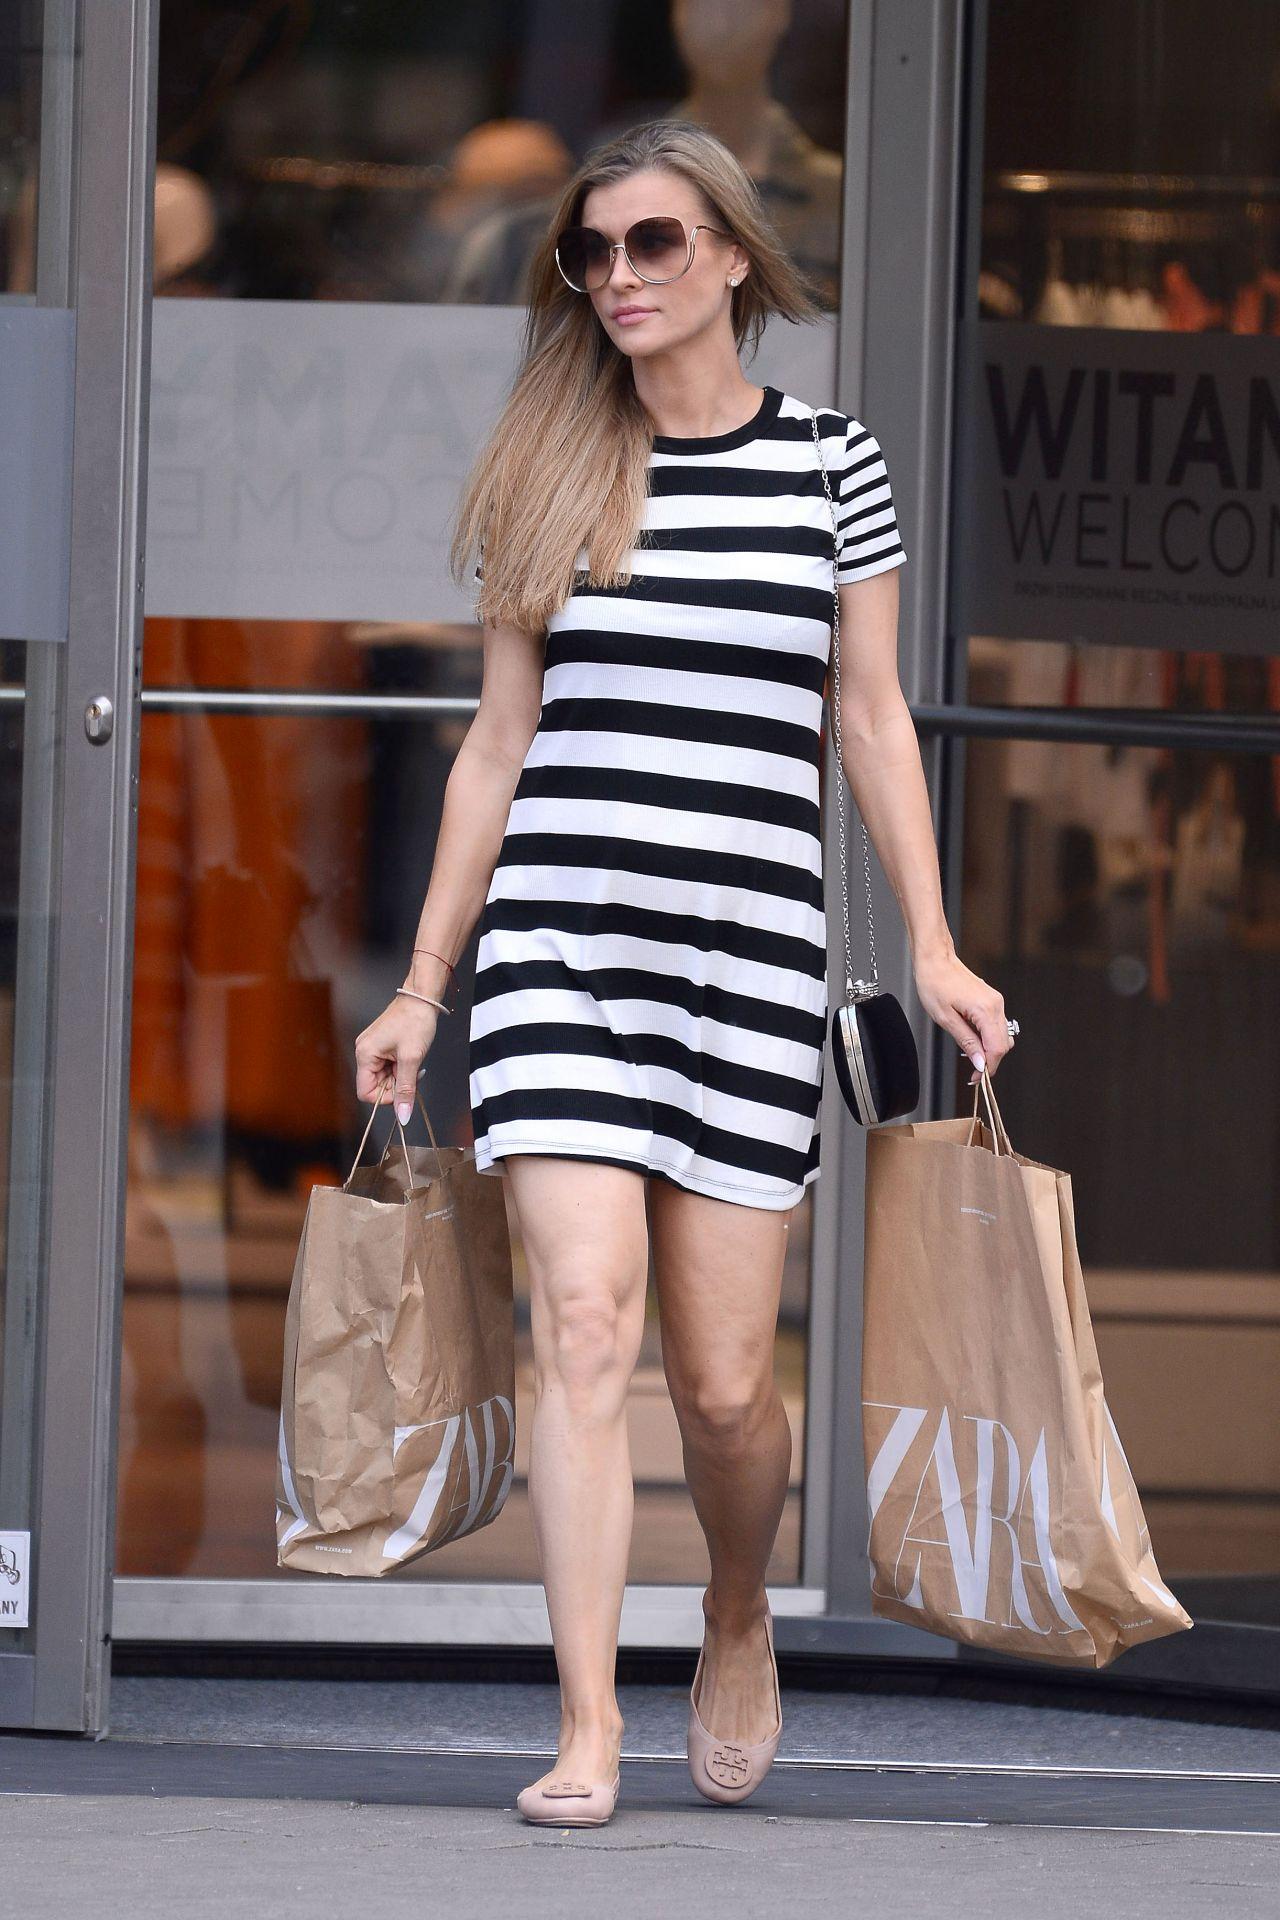 Mini Las Vegas >> Joanna Krupa in Summer Mini Dress 05/27/2019